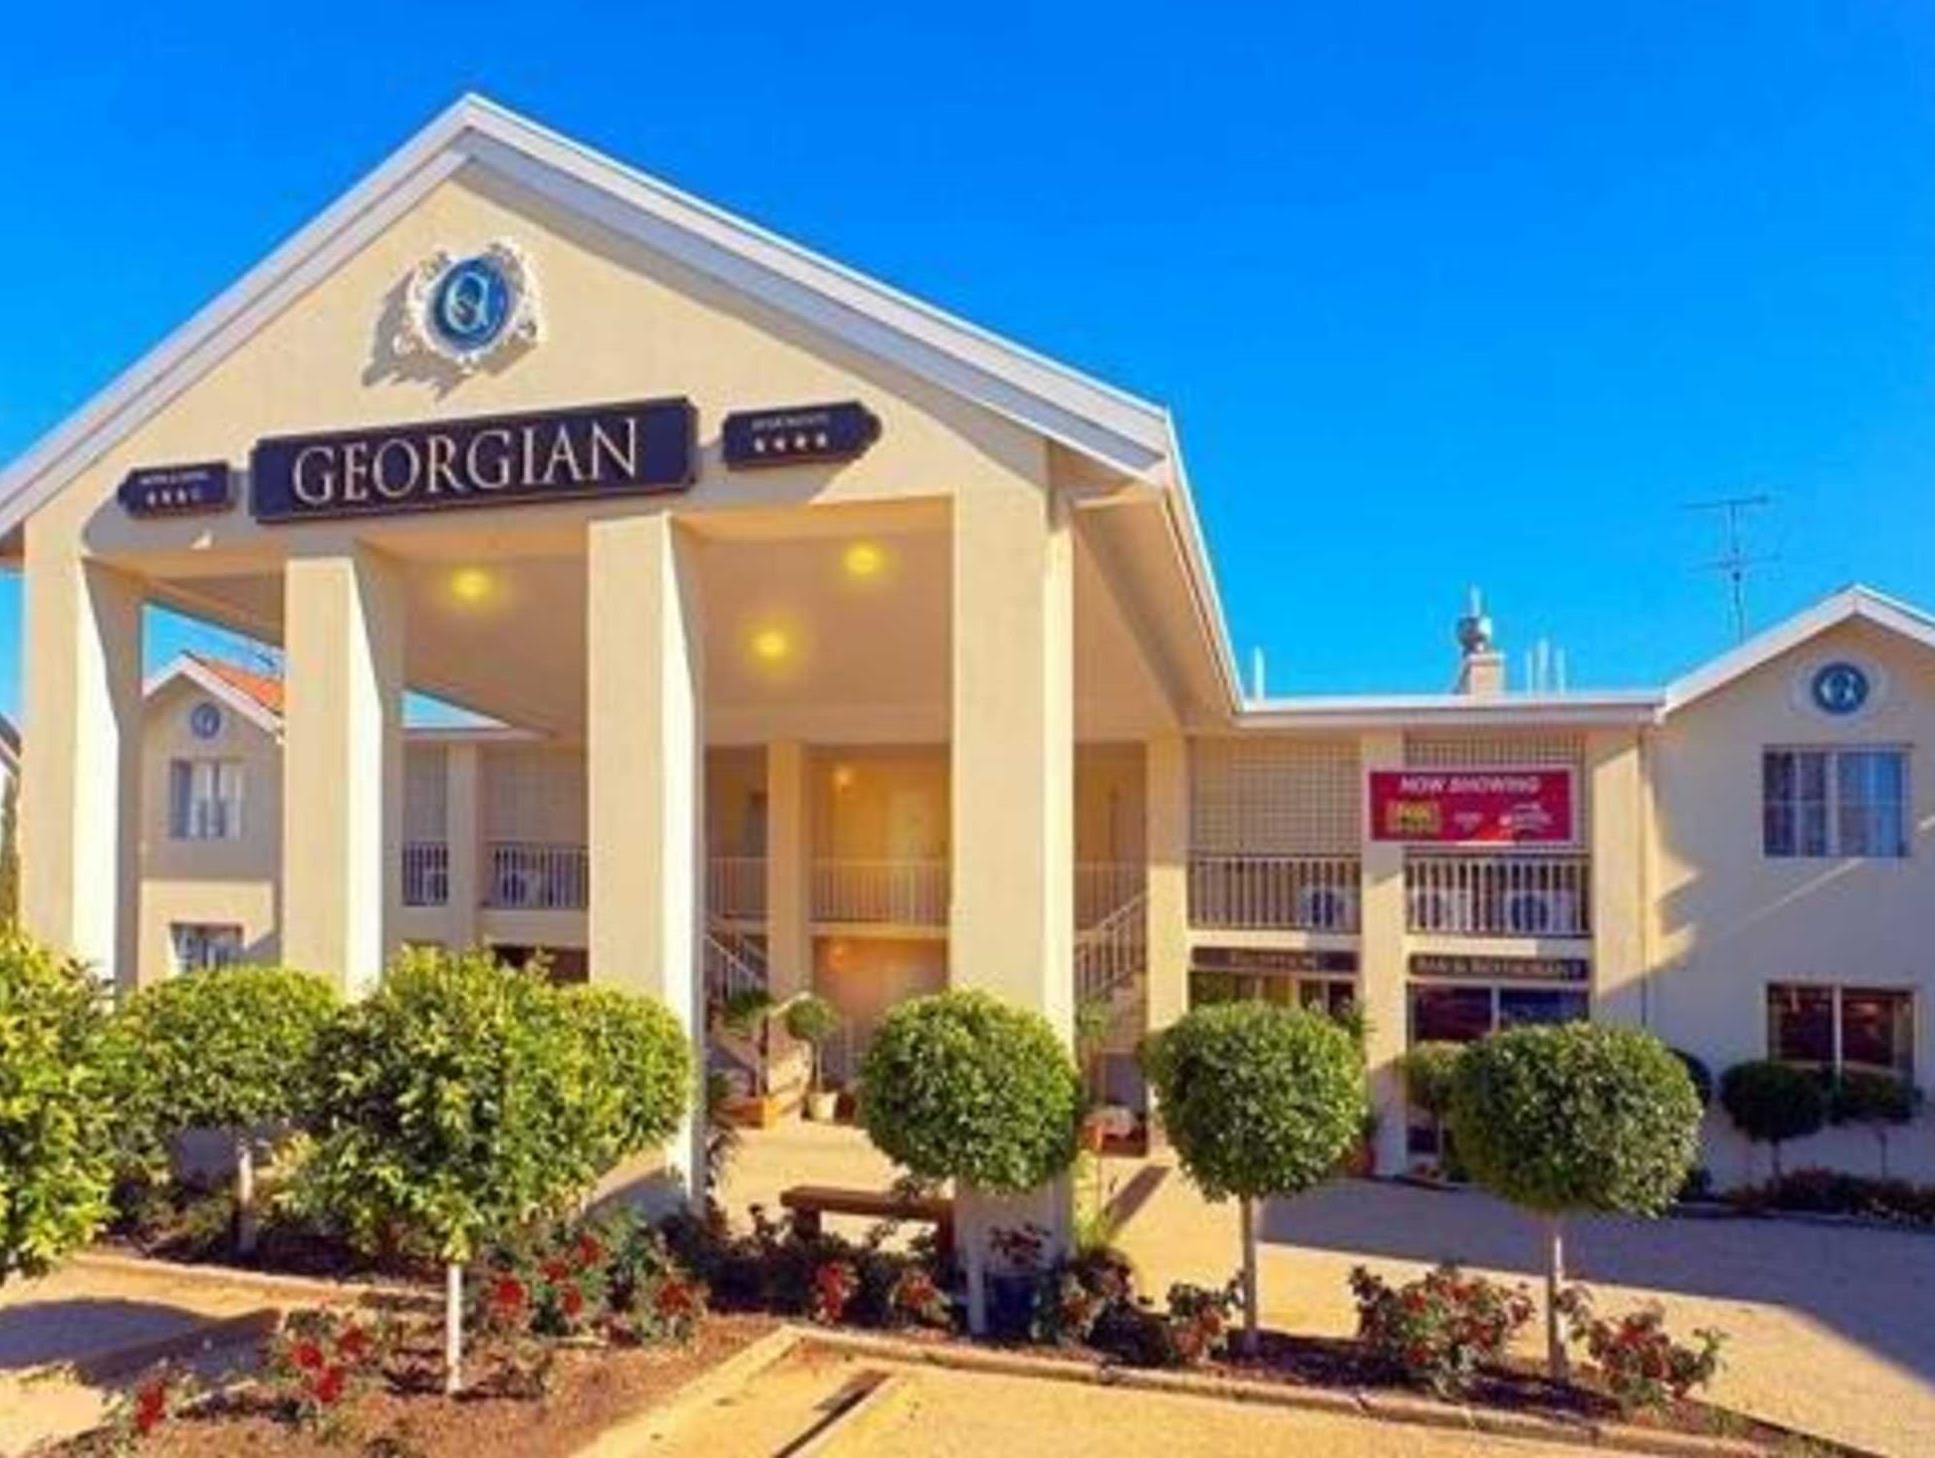 Comfort Inn & Suites Georgian, Albury